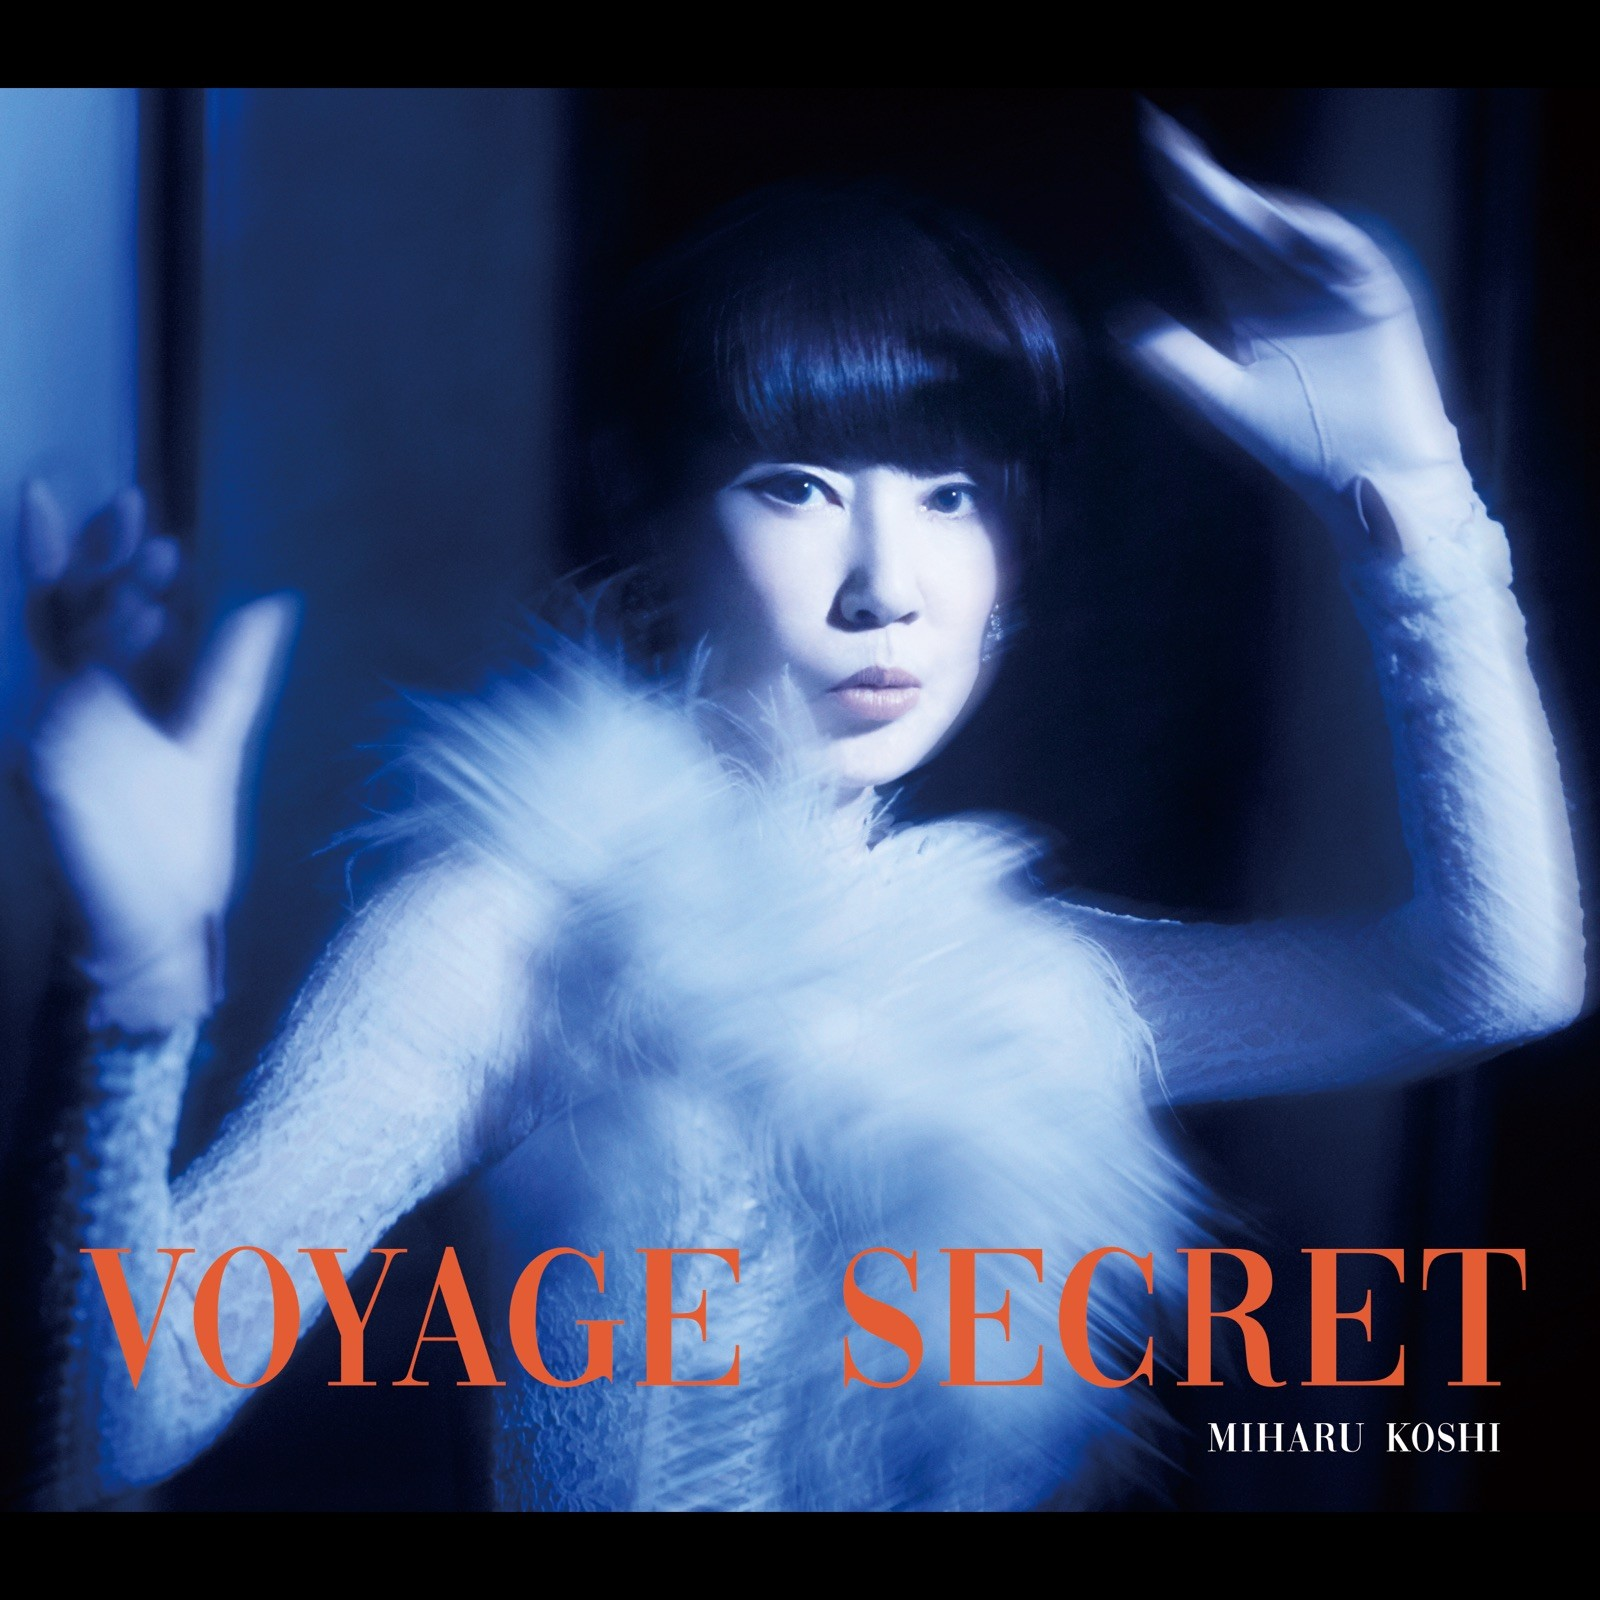 [Album] 越美晴/コシミハル (Miharu Koshi) – 秘密の旅 VOYAGE SECRET [FLAC / WEB] [2021.09.15]